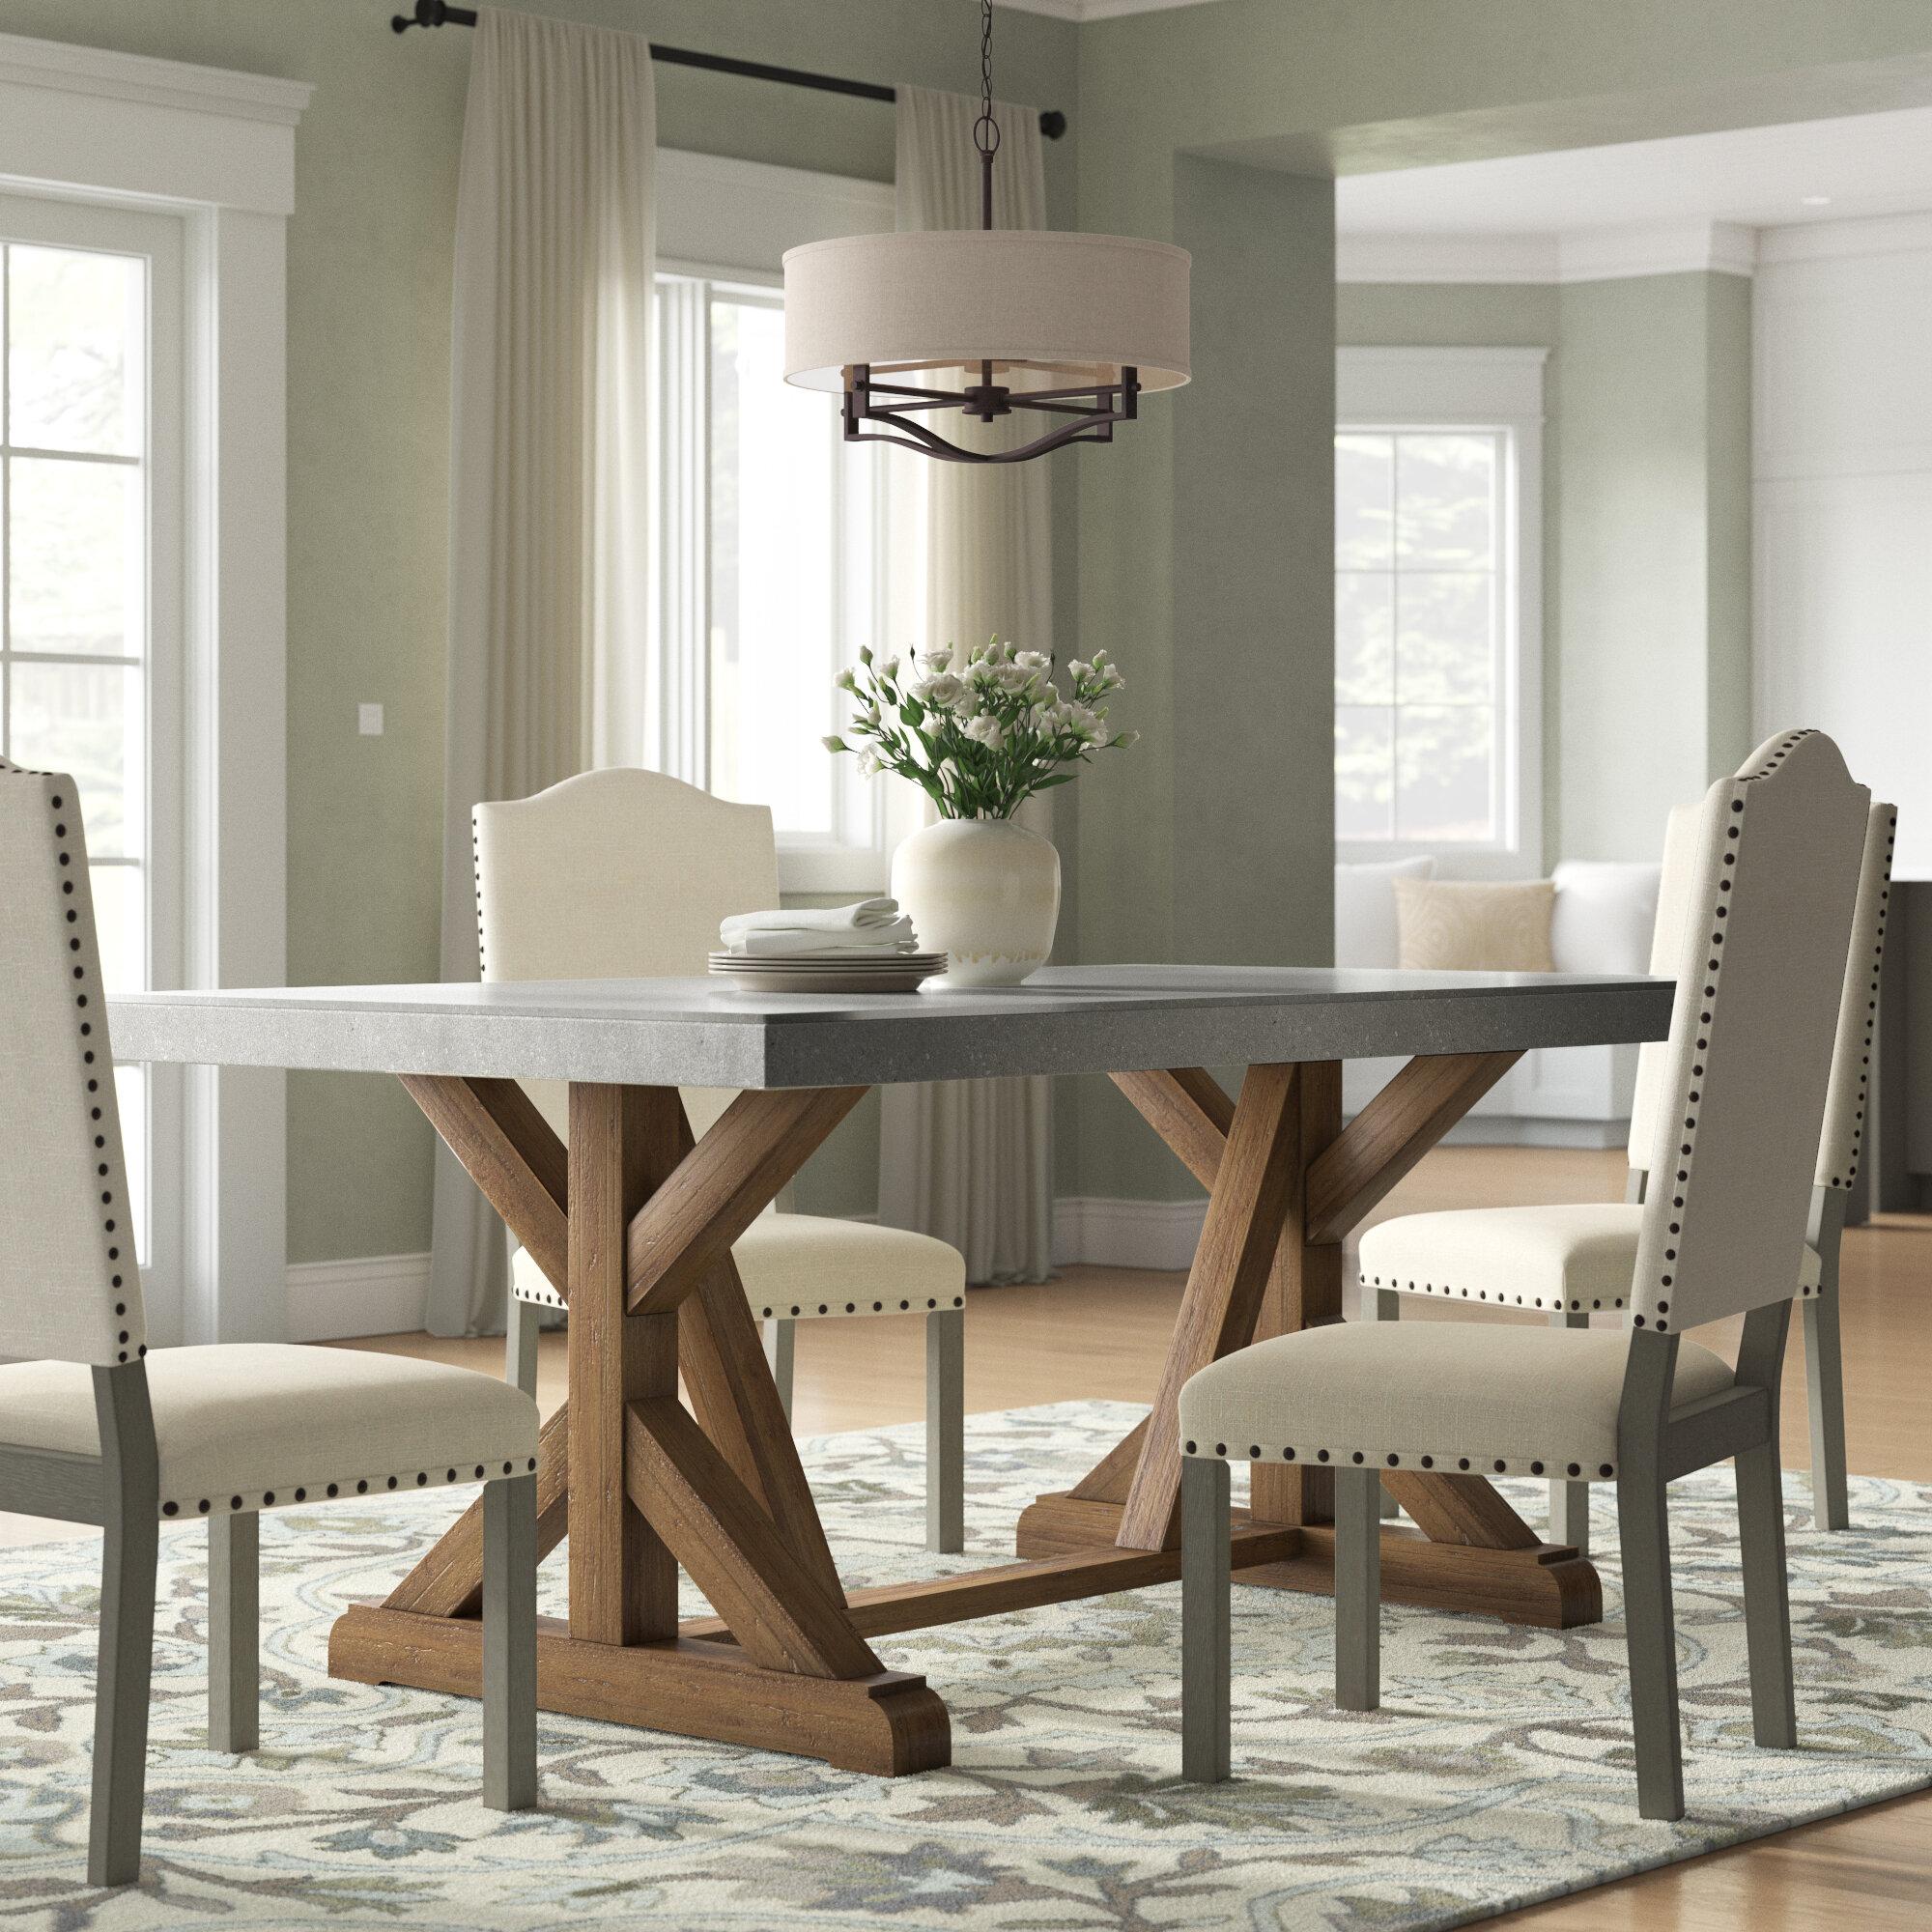 Charlton Home Wydmire Dining Table & Reviews | Wayfair